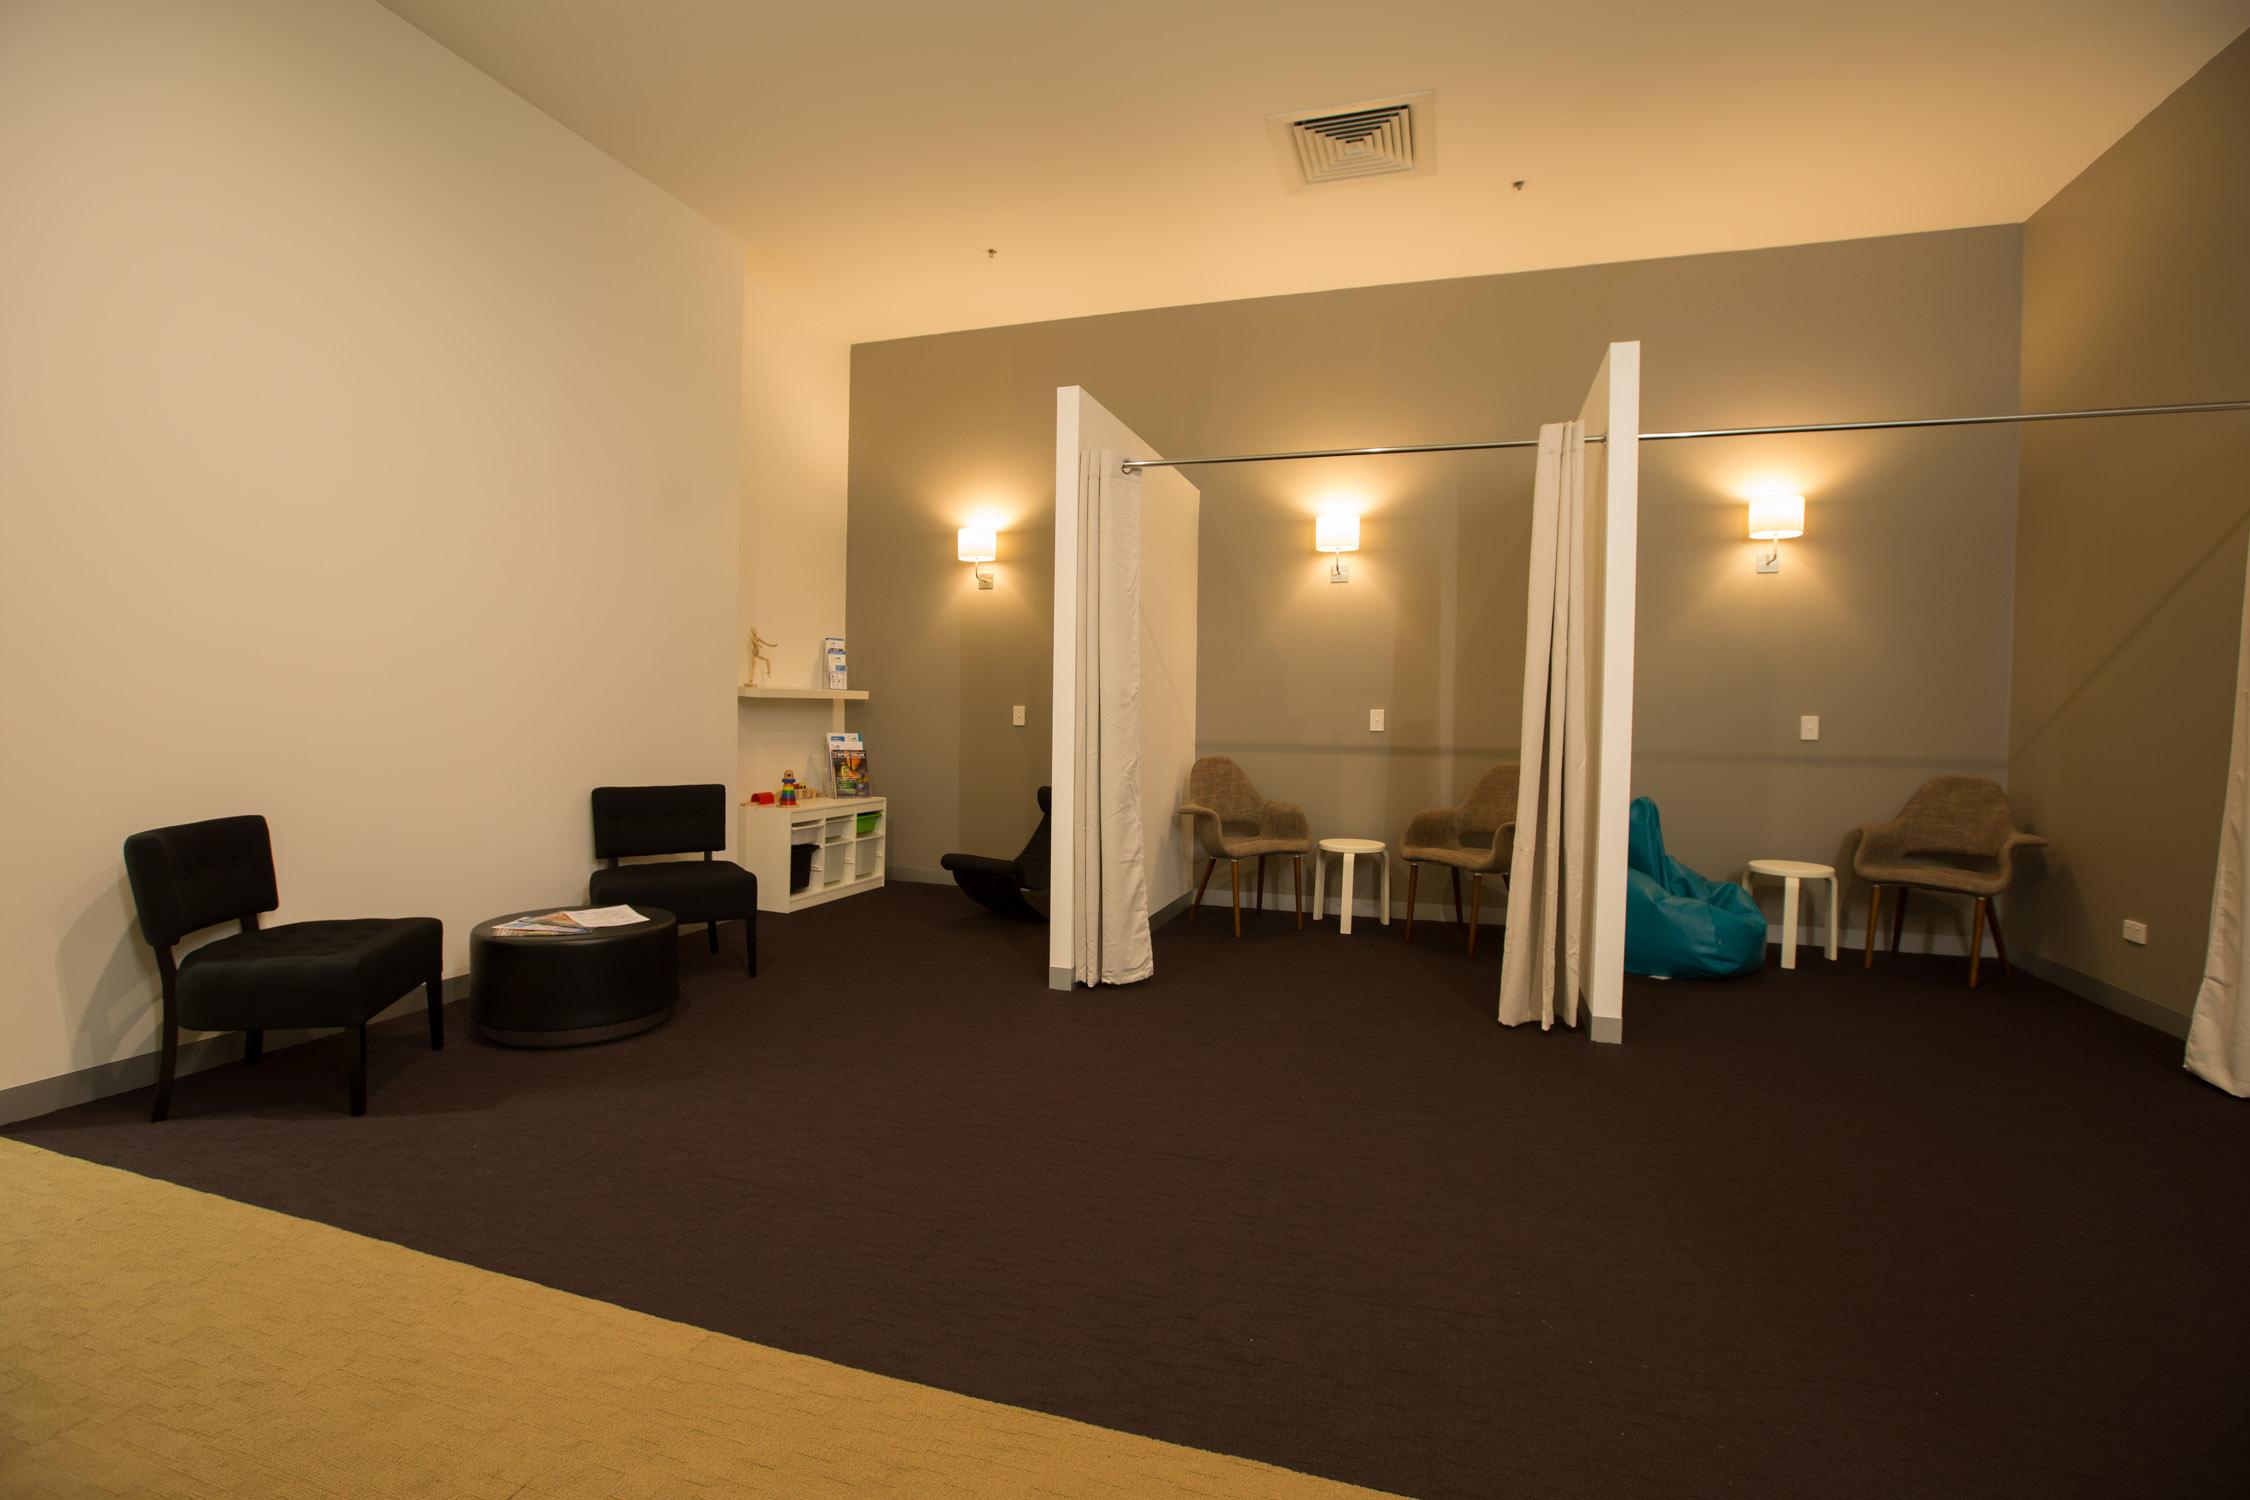 39 Quiet Room 39 Opens In Australian Shopping Centre Autism